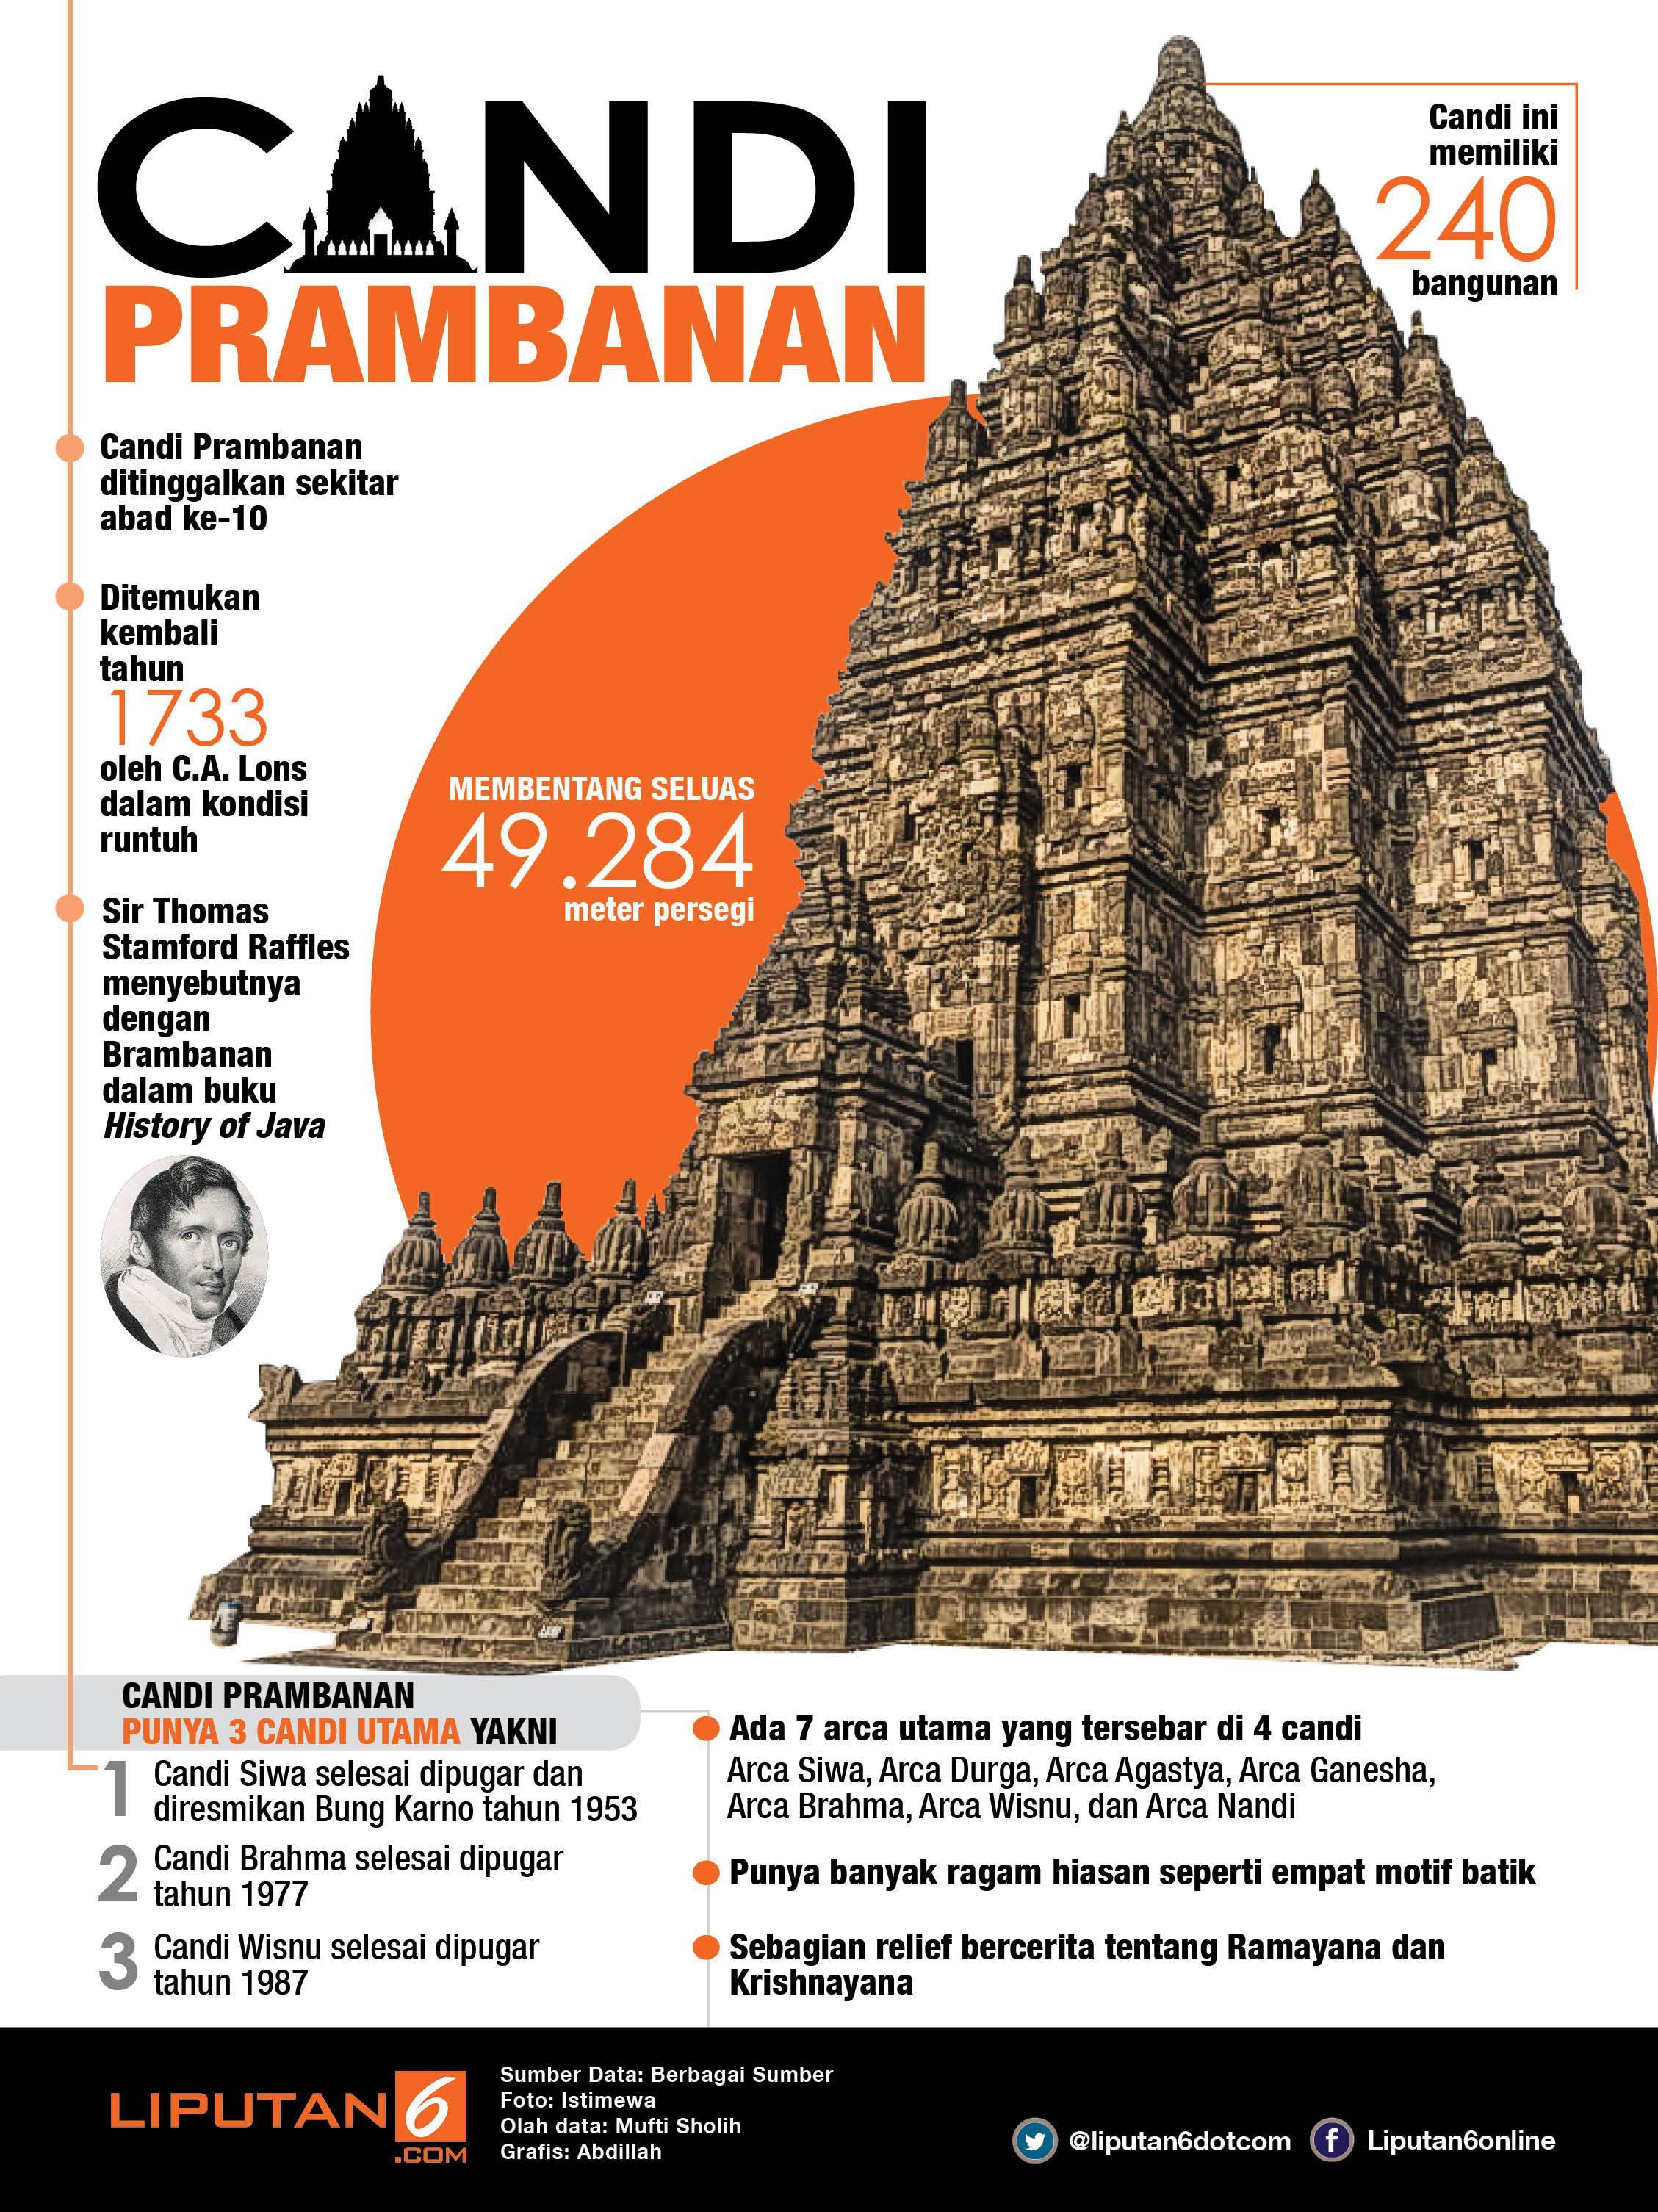 Infografis Candi Prambanan (Liputan6.com/Abdillah)